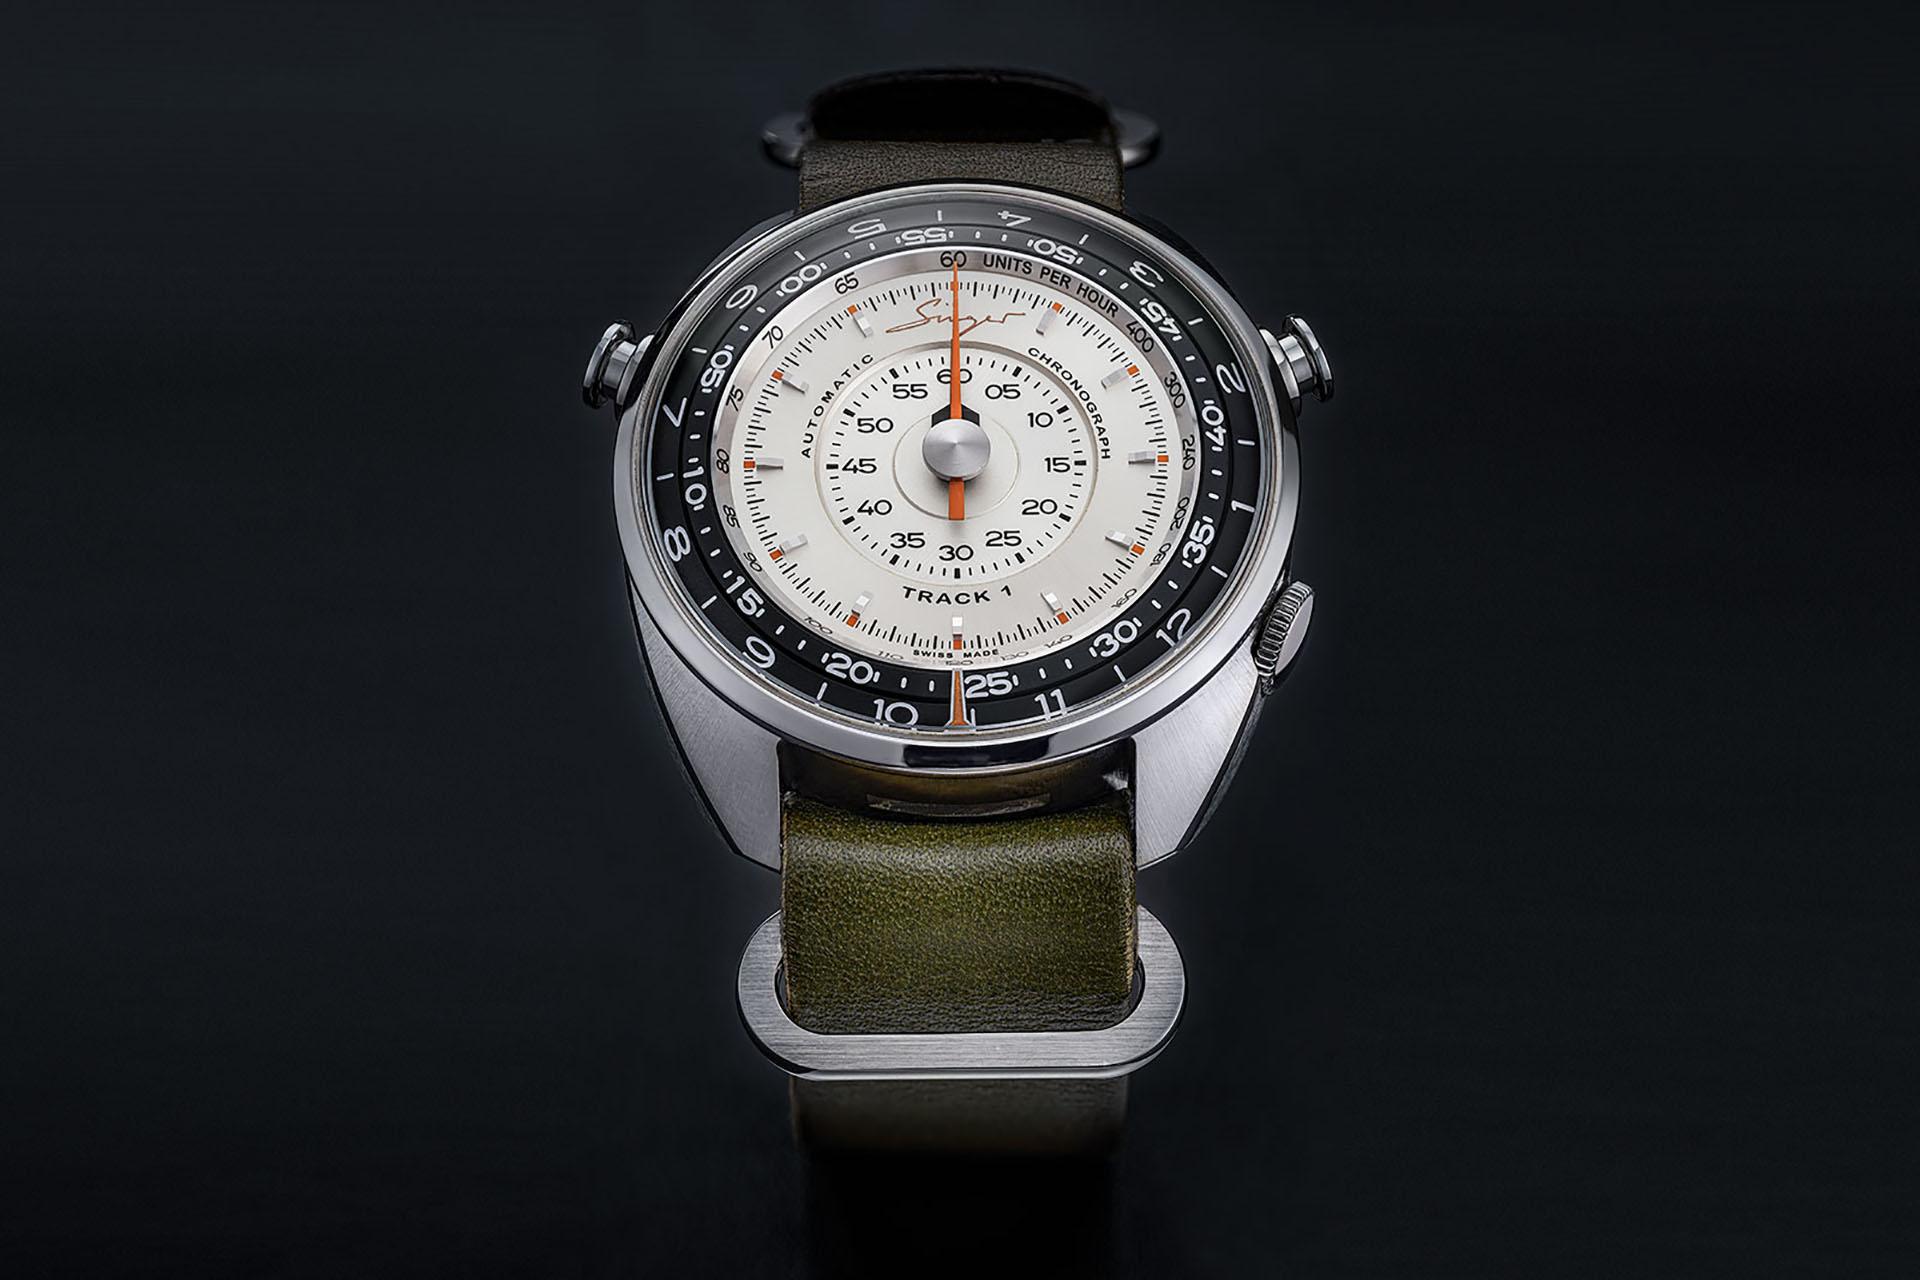 Singer Reimagined Track 1 Prototype Watch